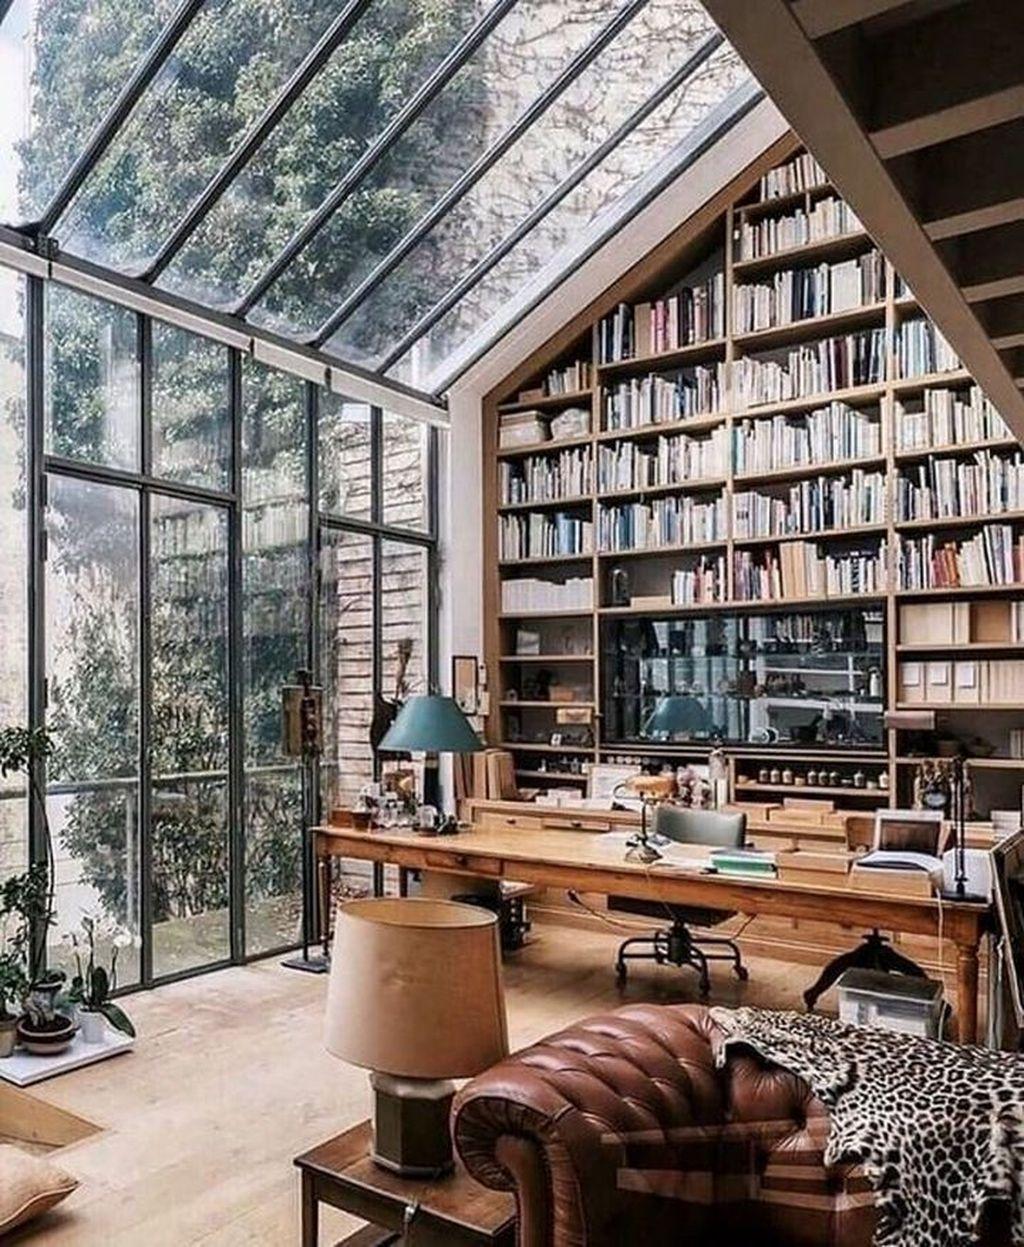 38 Amazing Modern Home Interior Design Ideas In 2020 House Renovation Plans Home Design Plans House Plans